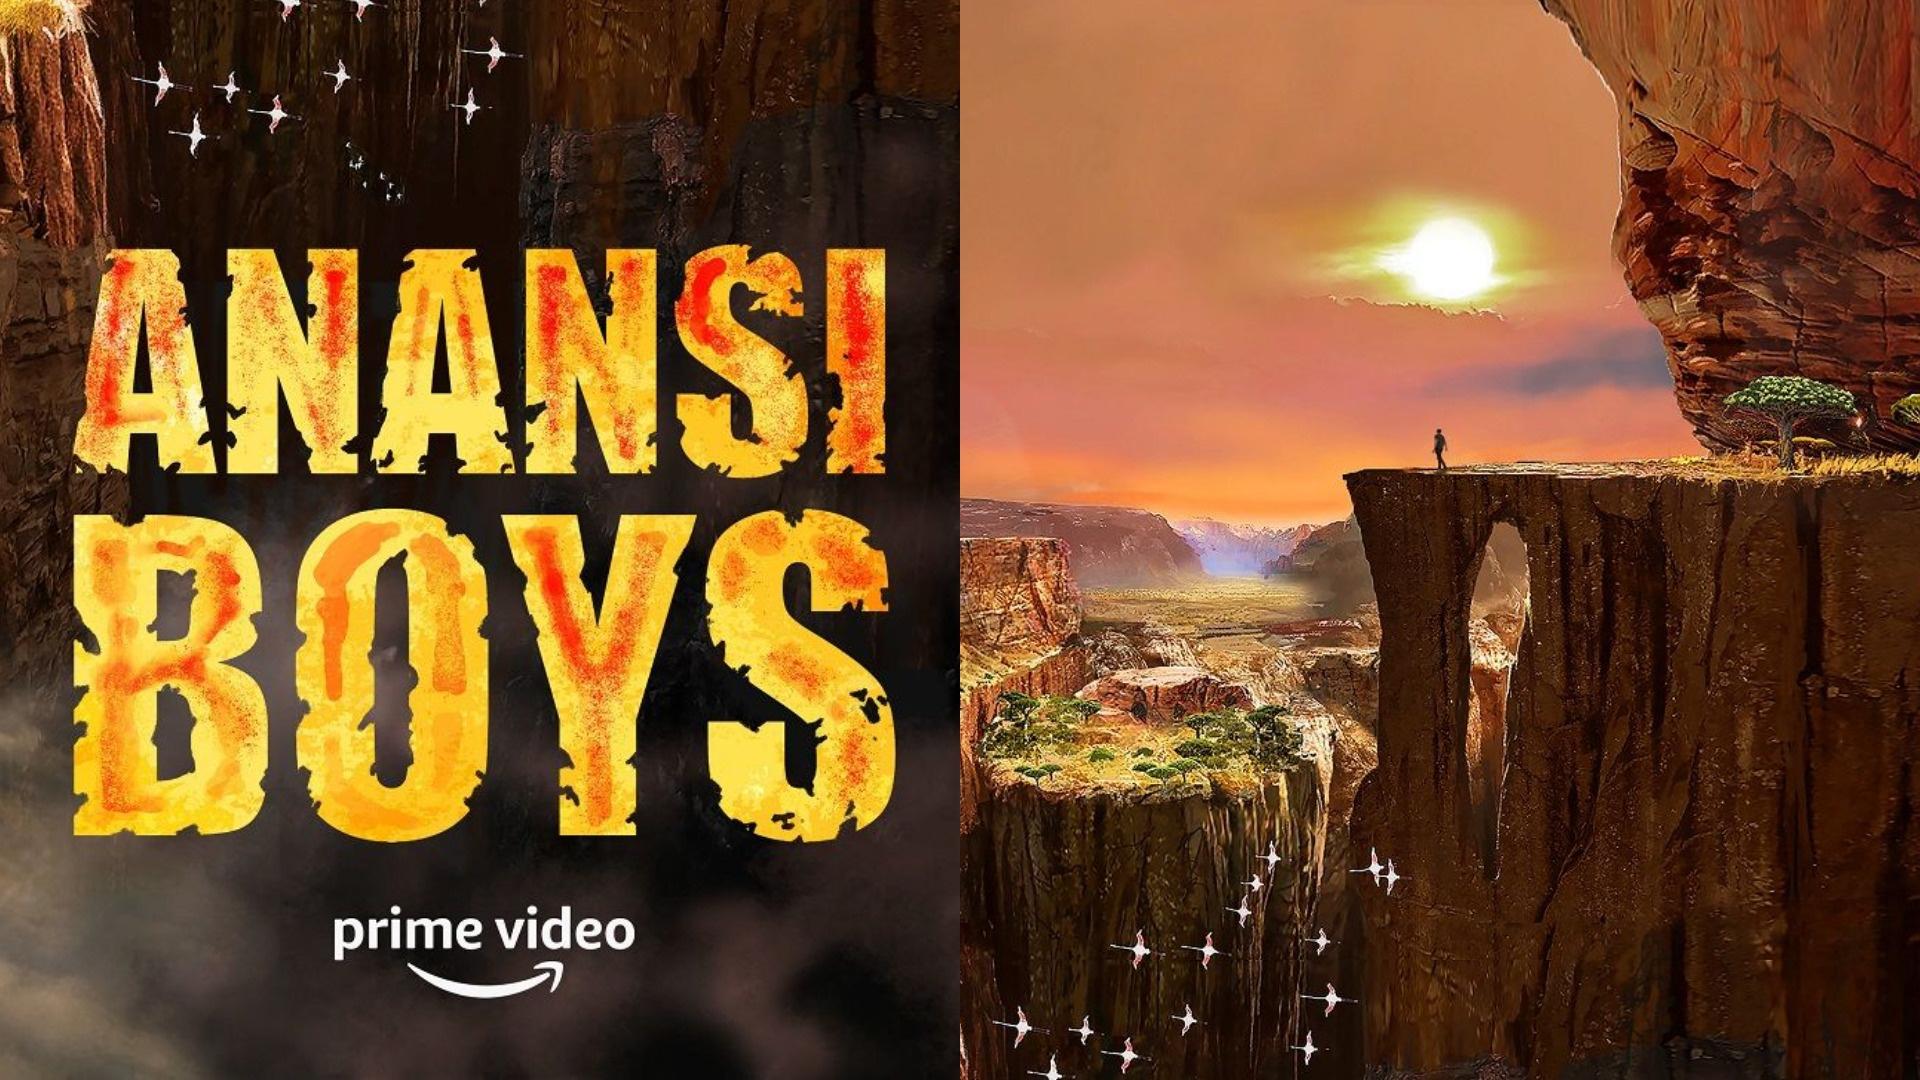 Amazon + Neil Gaiman's UK TV Series 'Anansi Boys' Is Greenlit and Casting